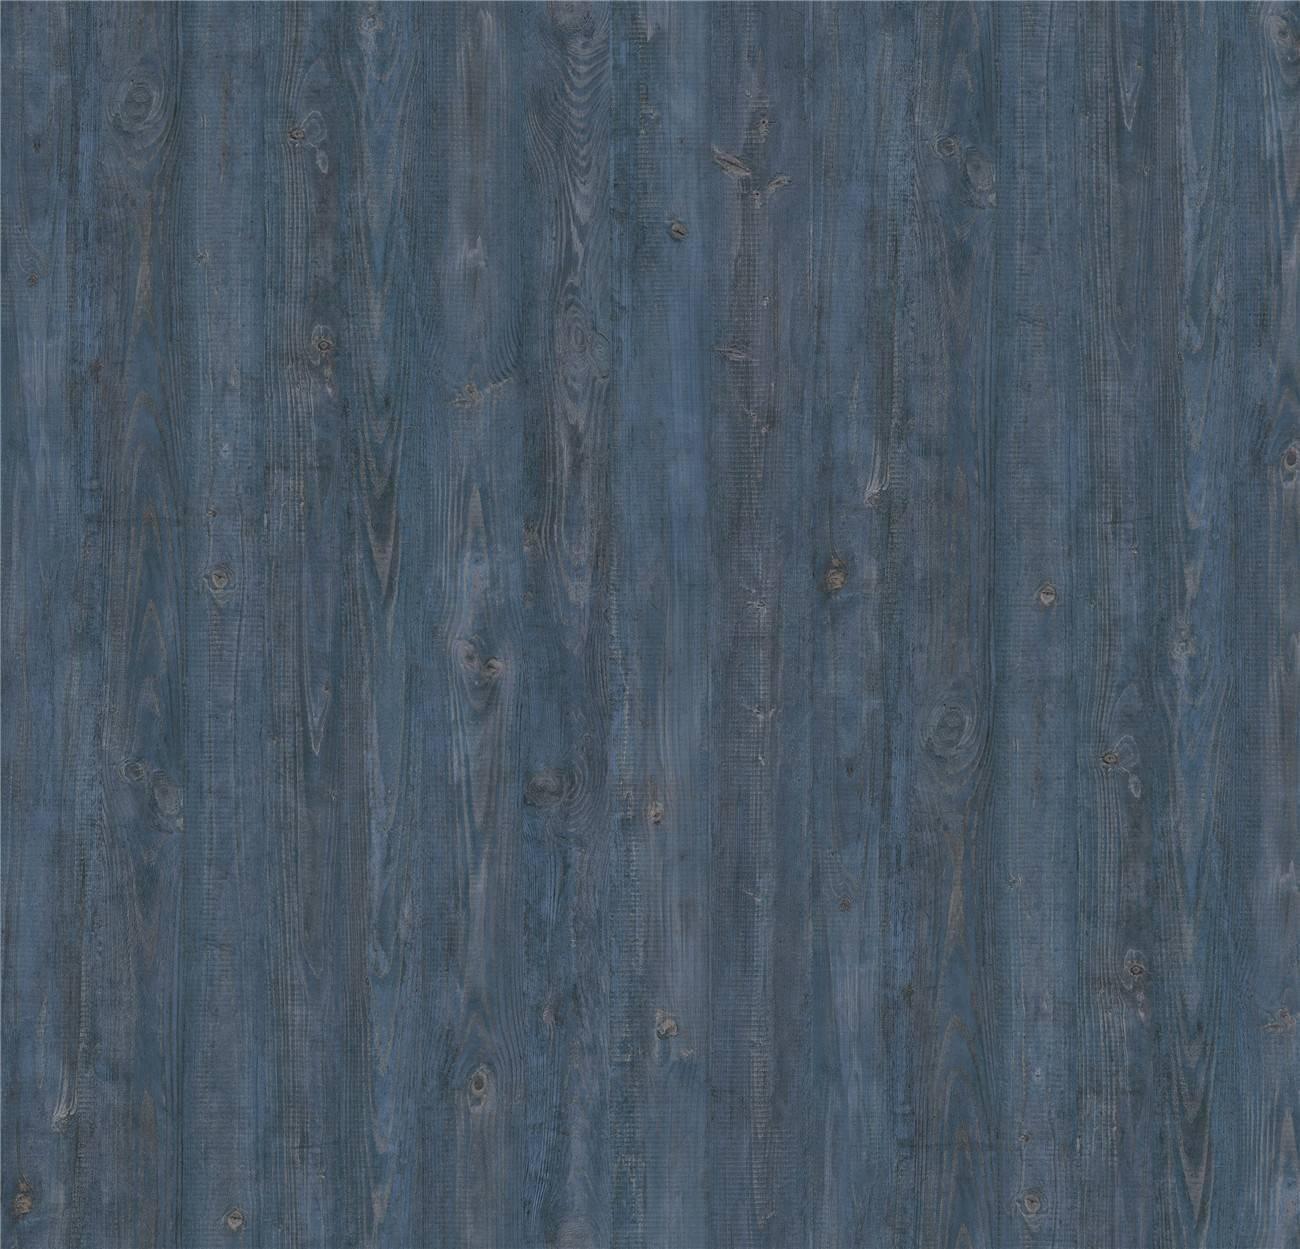 ID7032-03 Hekios Pine